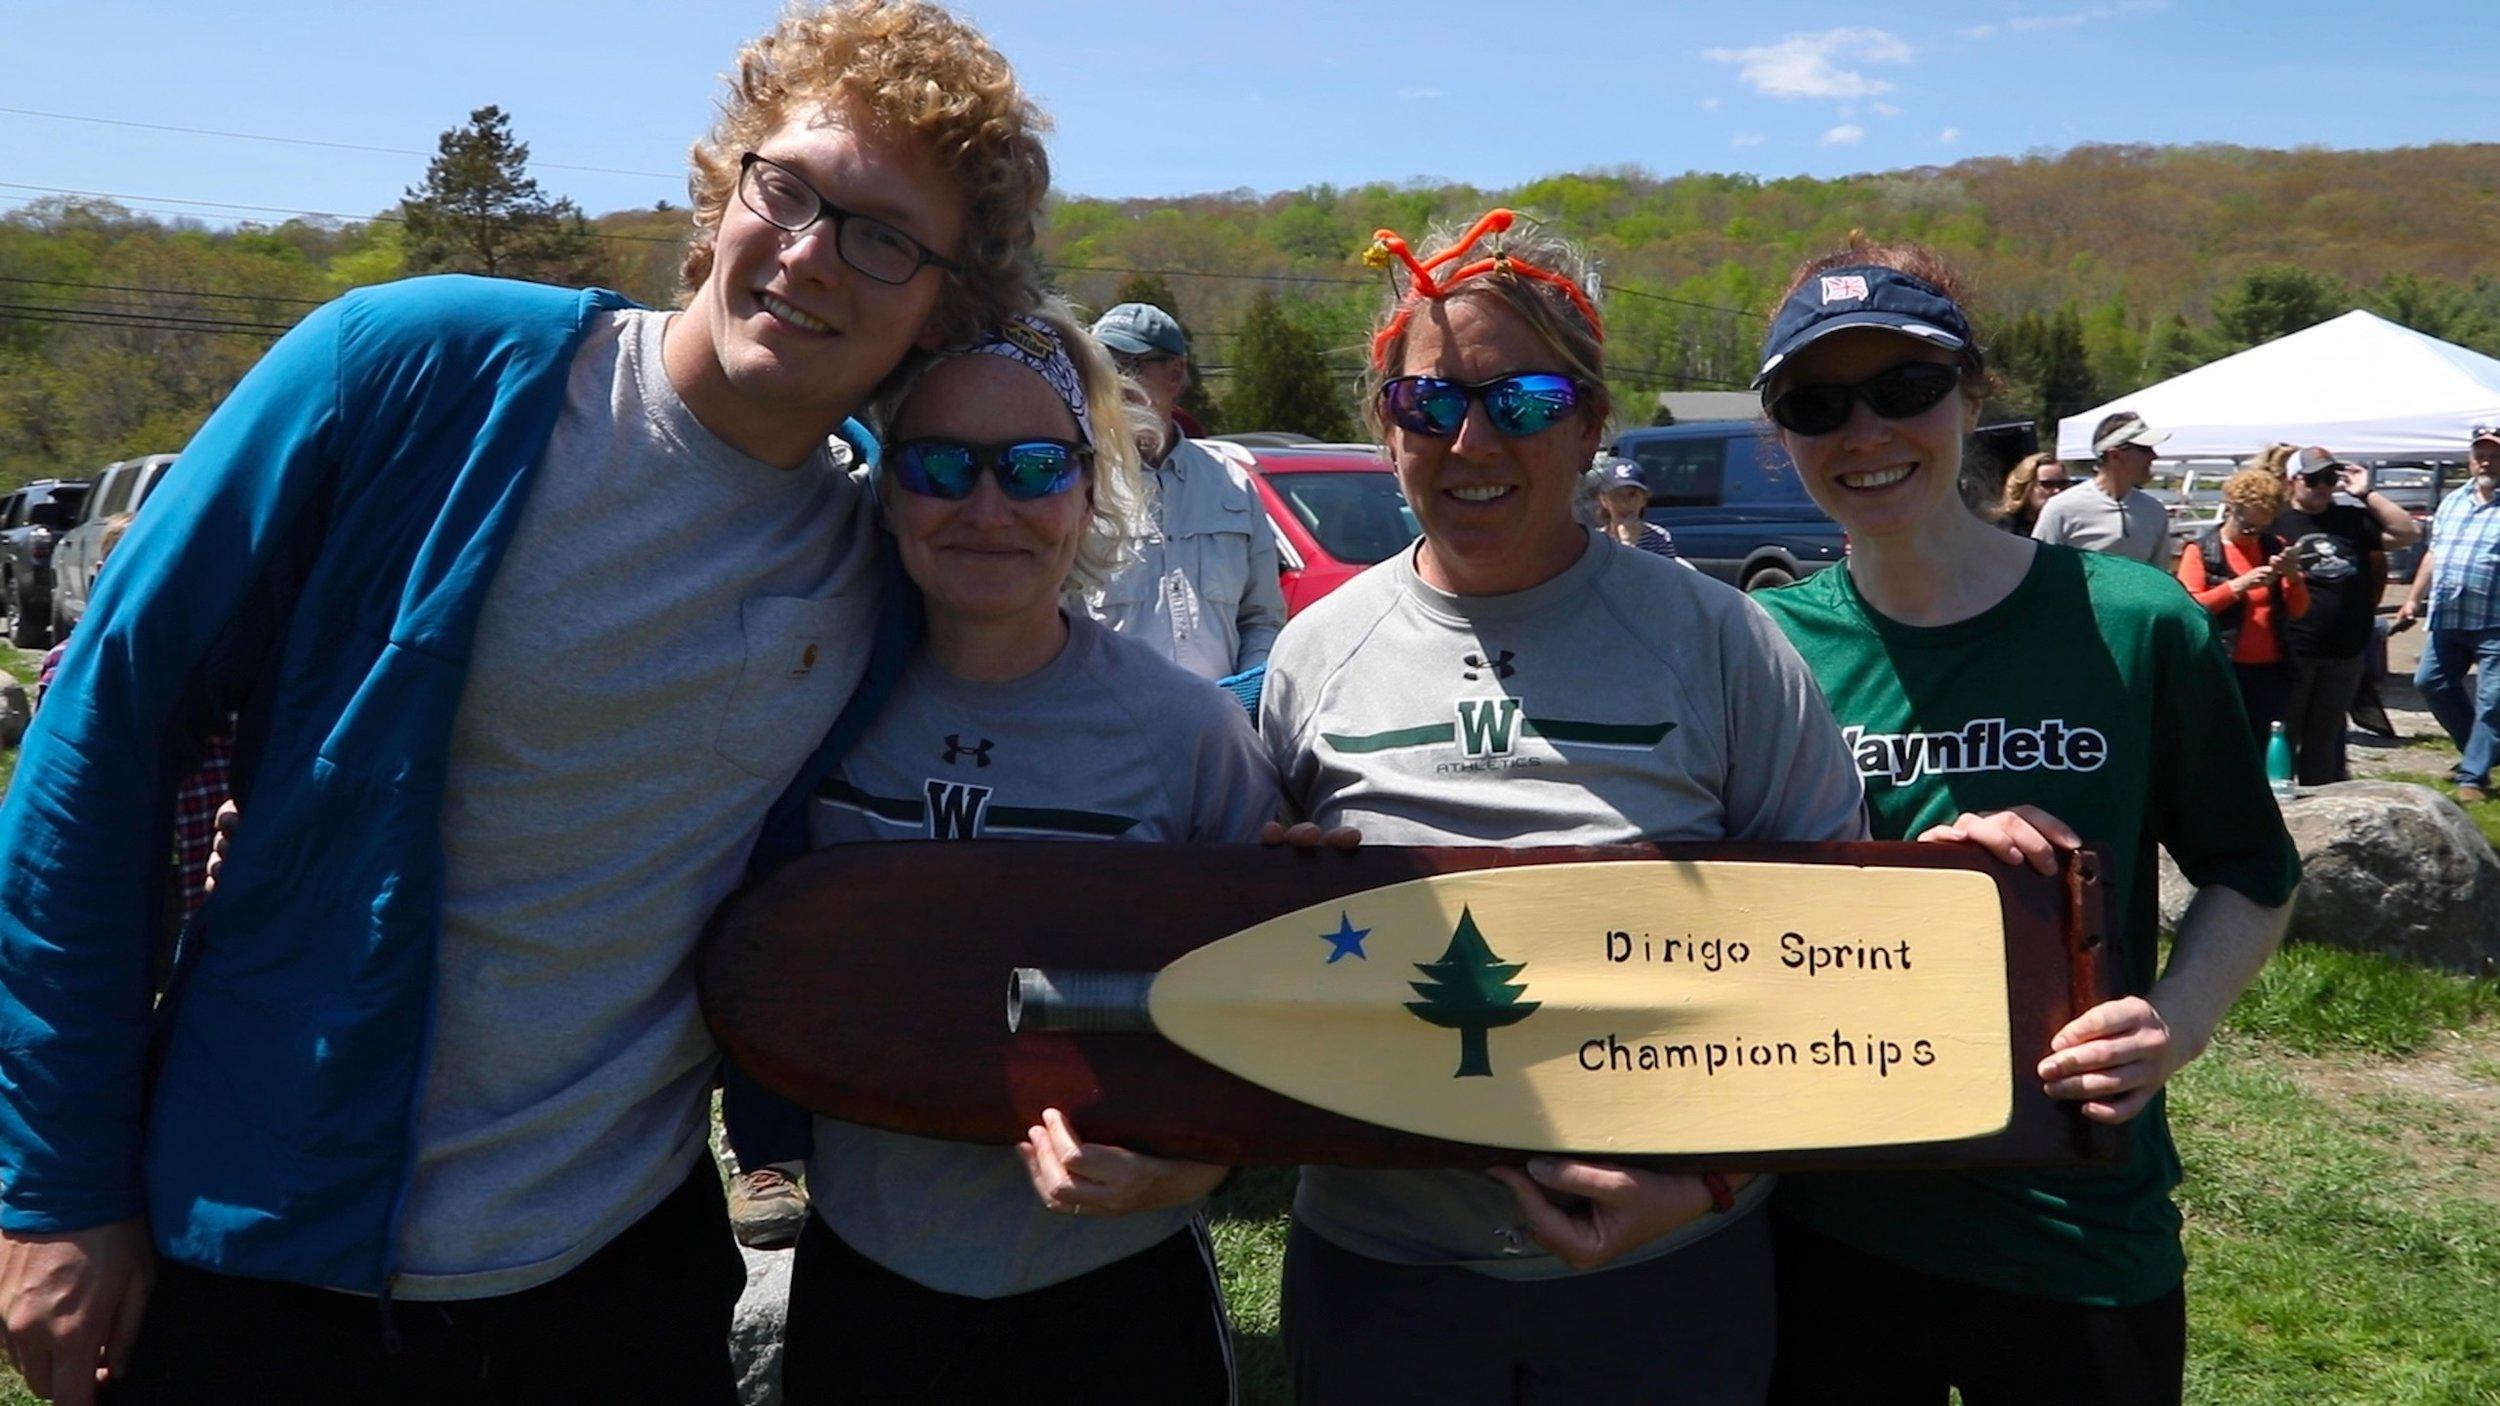 2019 Dirigo Sprint champions congratulations waynflete! -